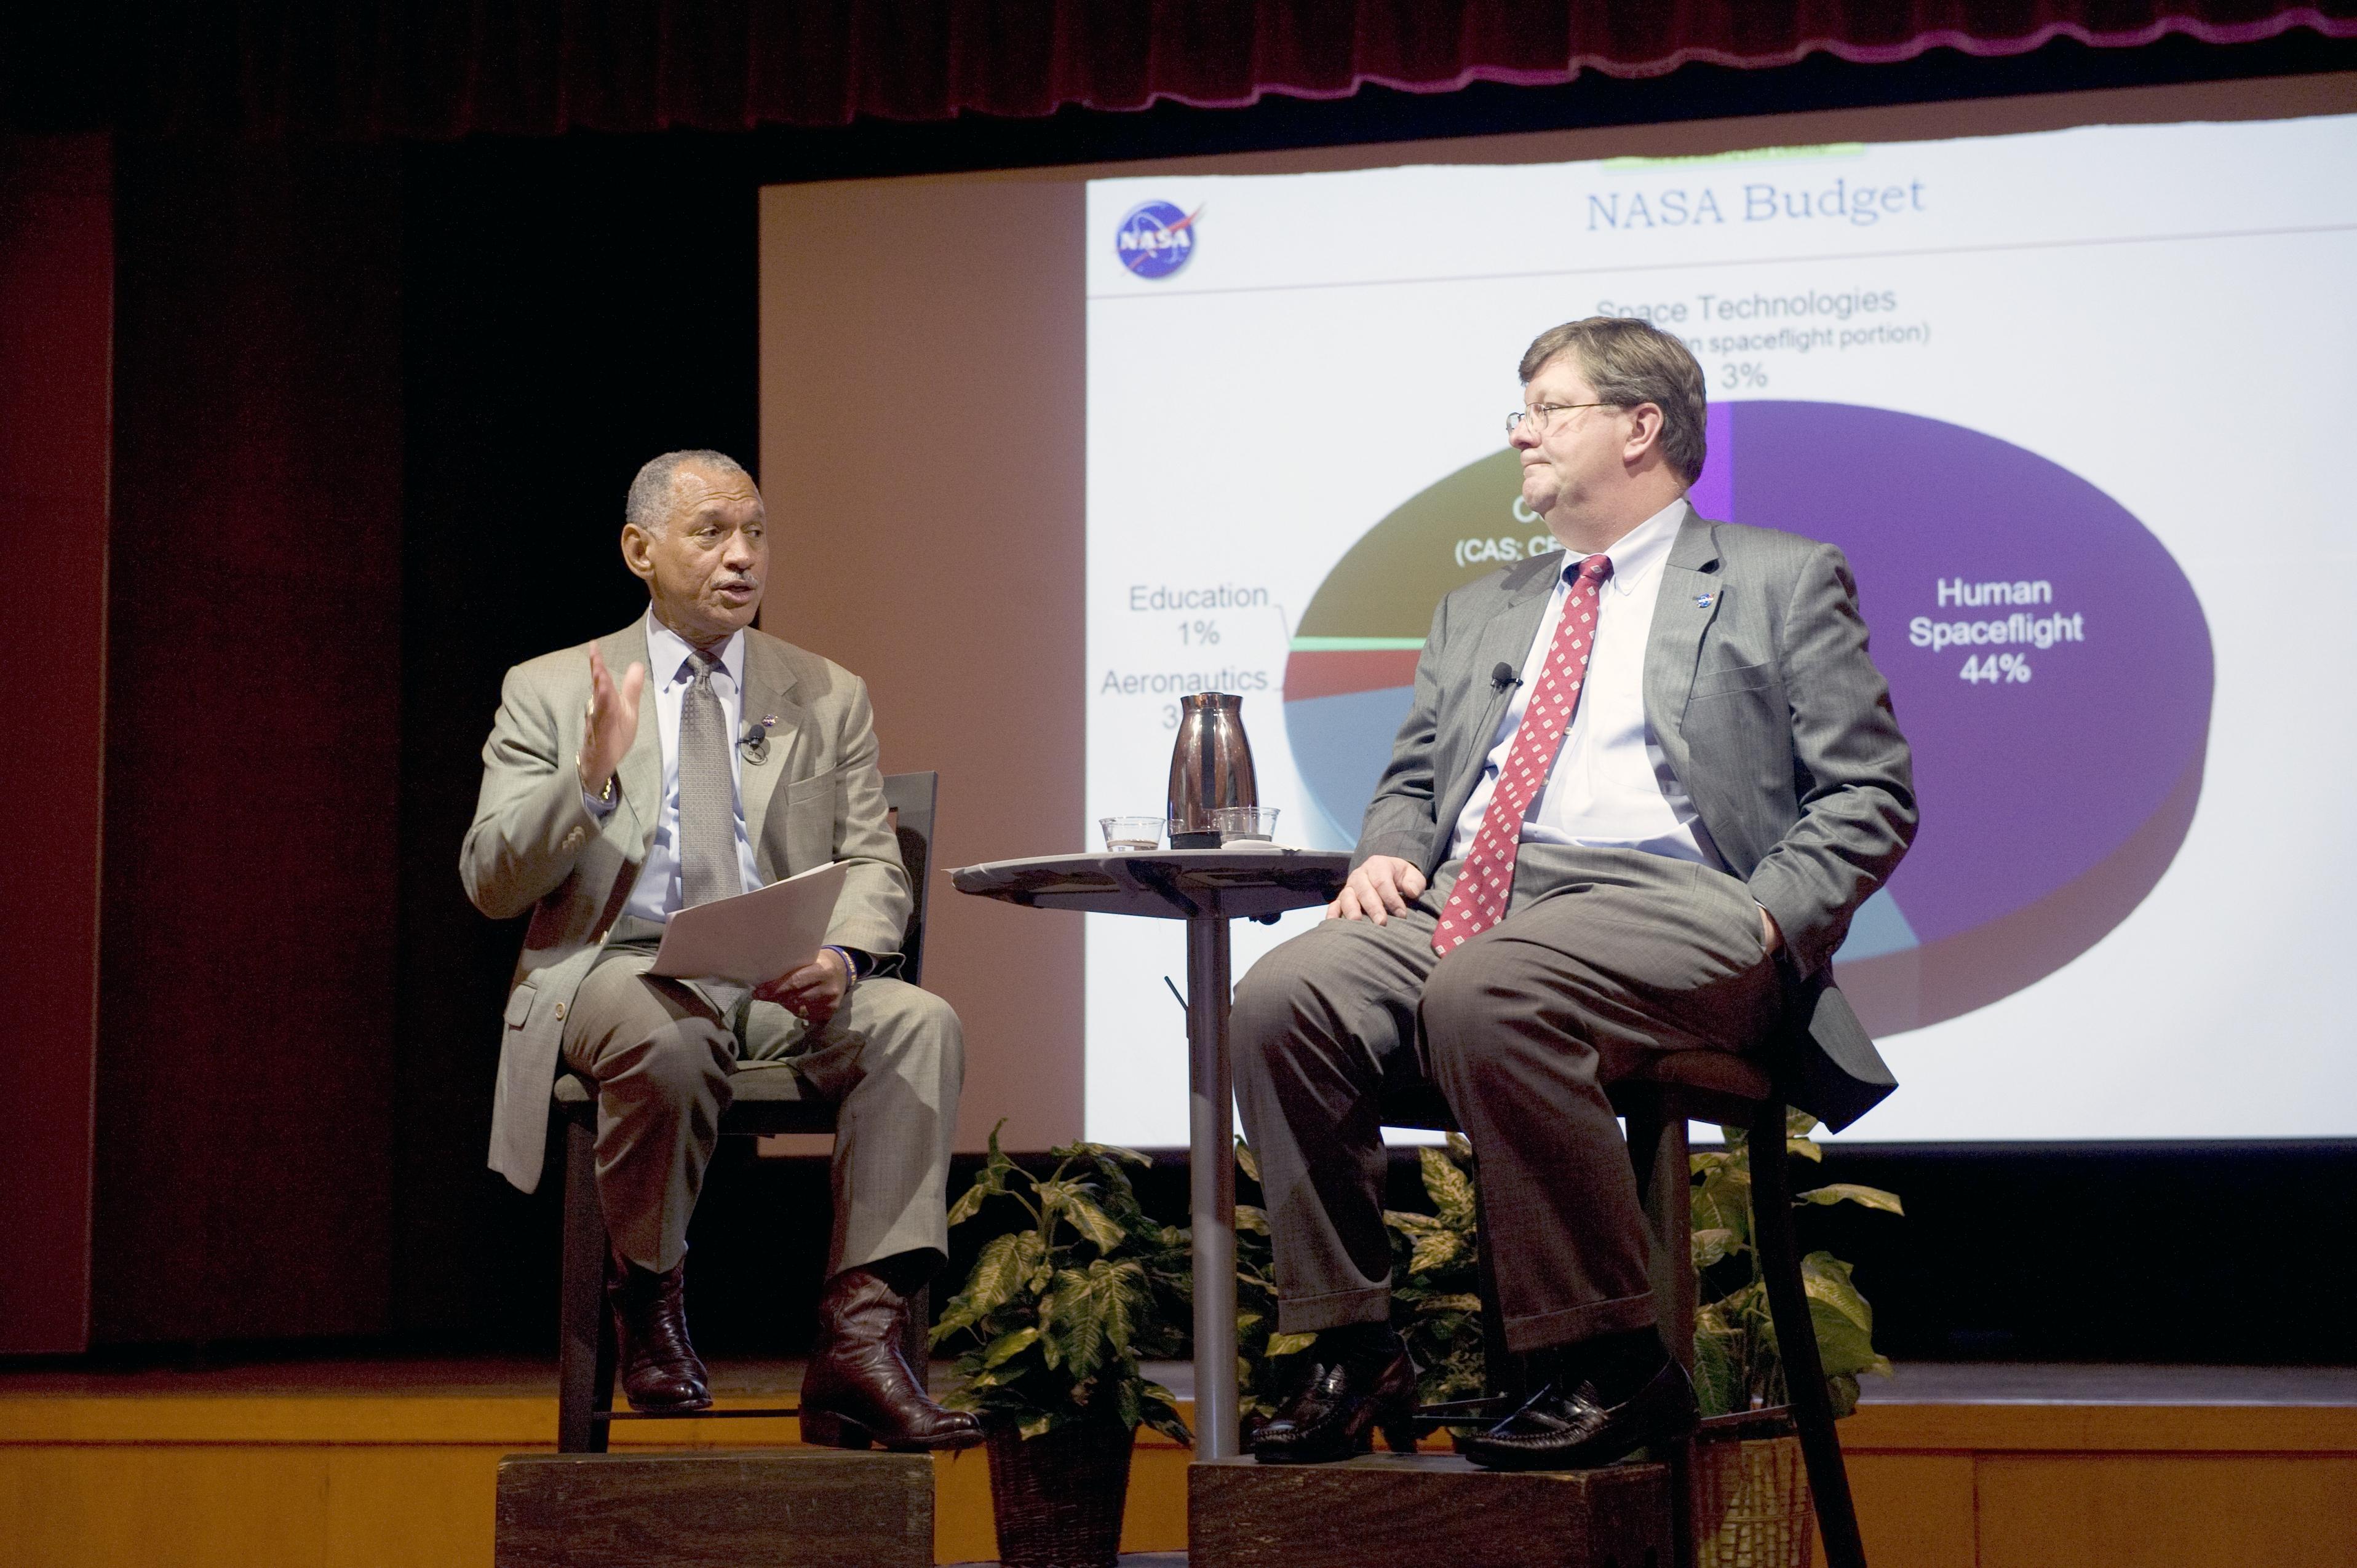 NASA ADMINISTRATOR CHARLES BOLDEN VISIT WITH GODDARD CENTER DIRECTOR ROBERT STRAIN AT ALL HANDS